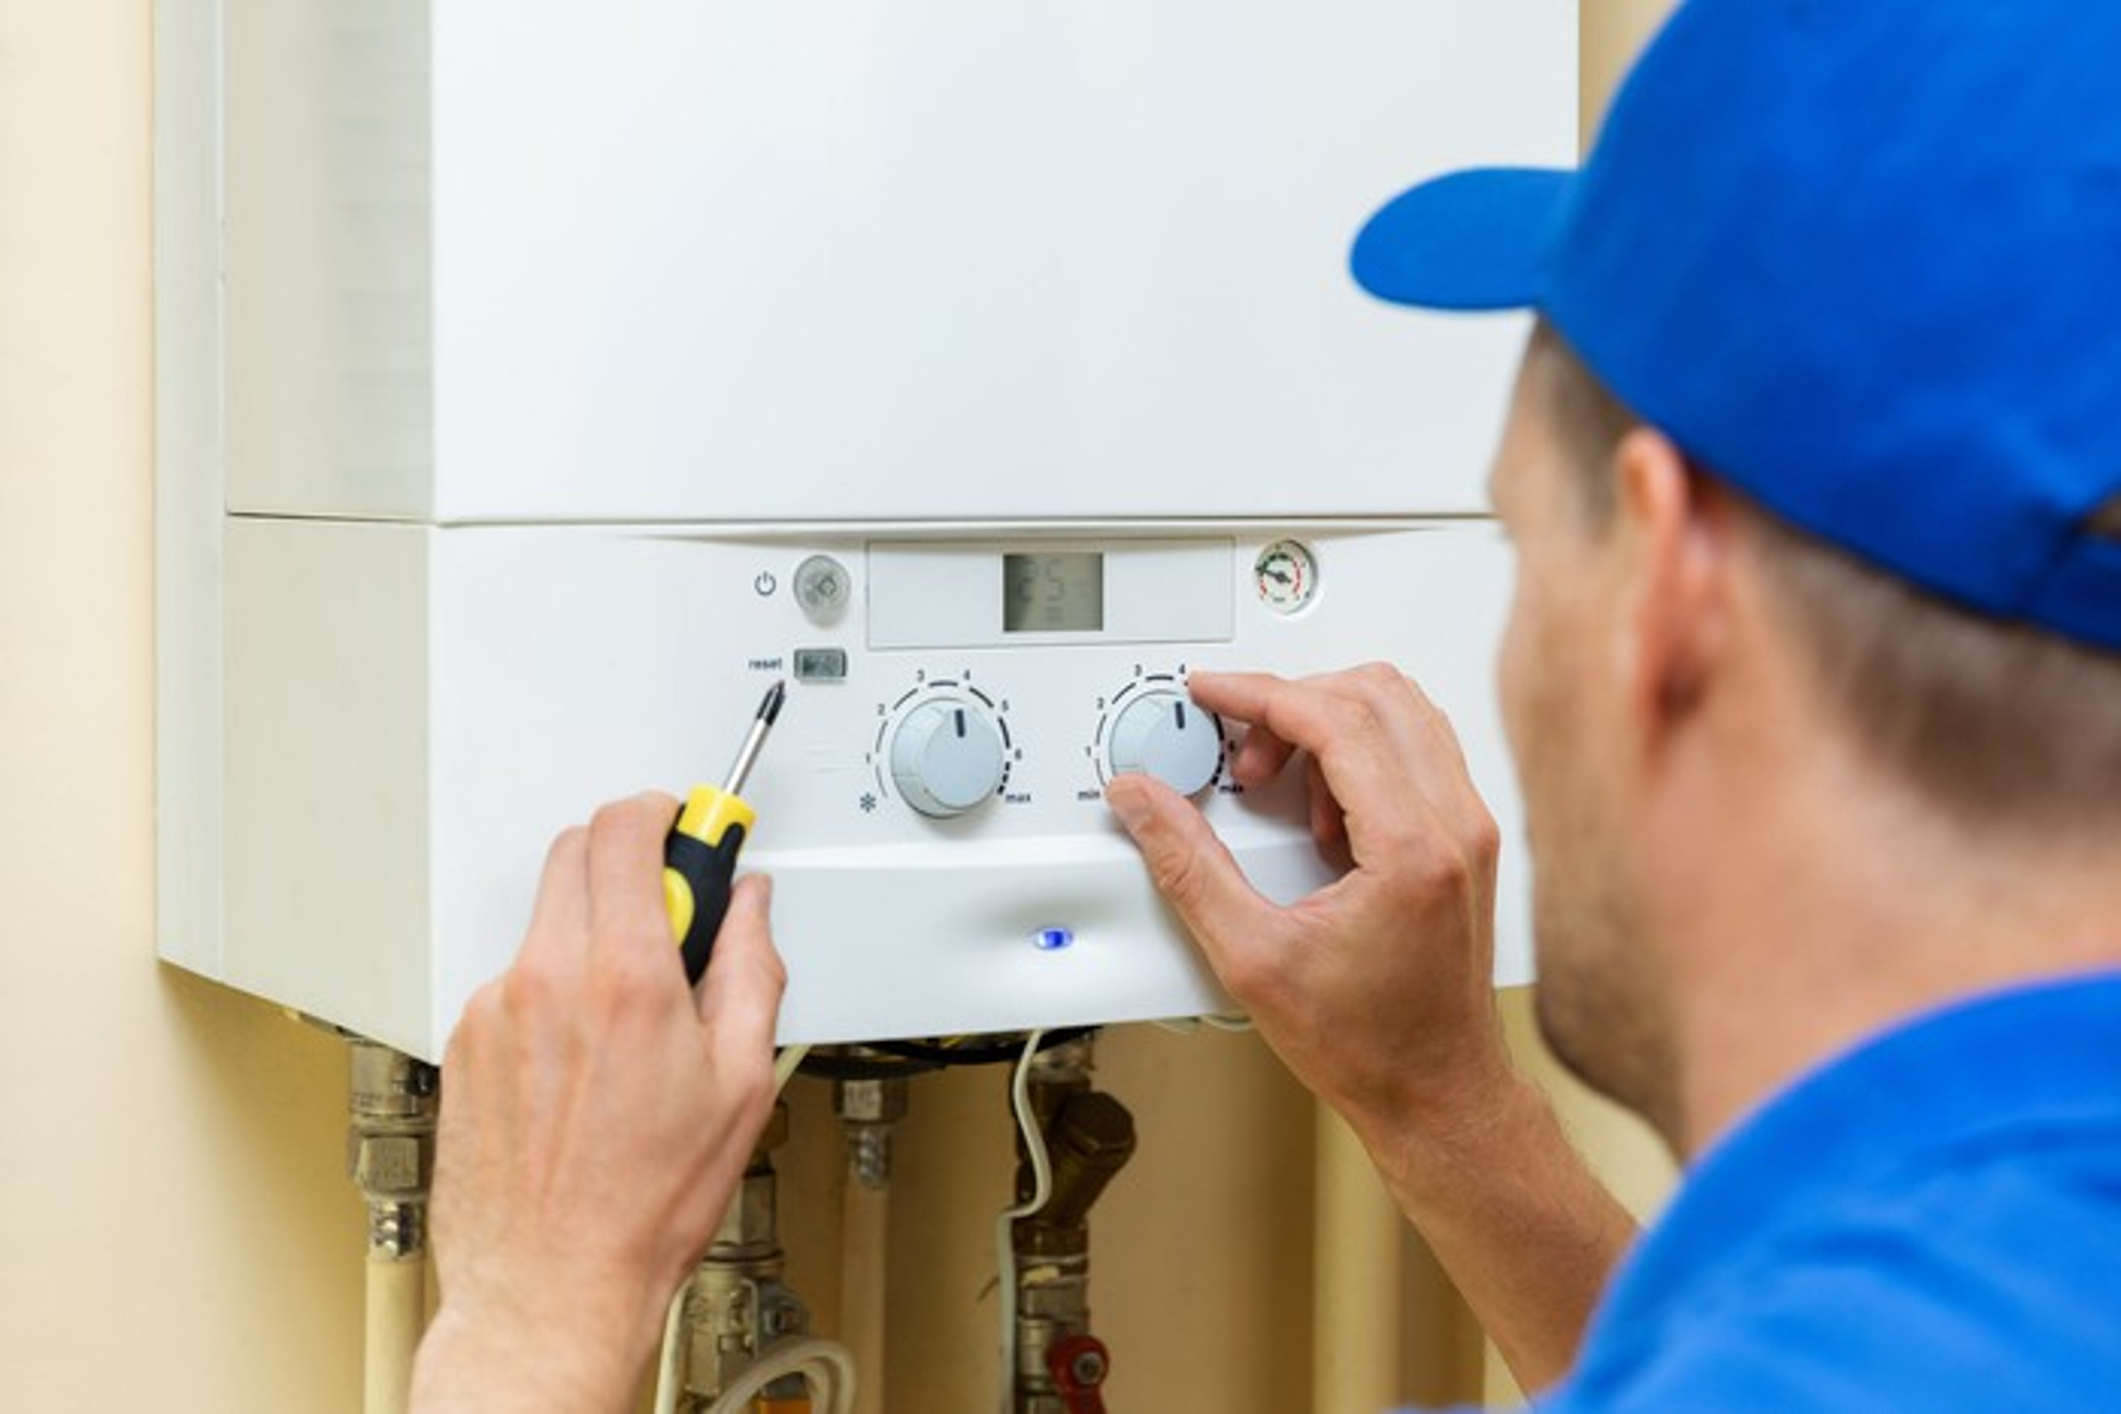 Mechanic installing water heater